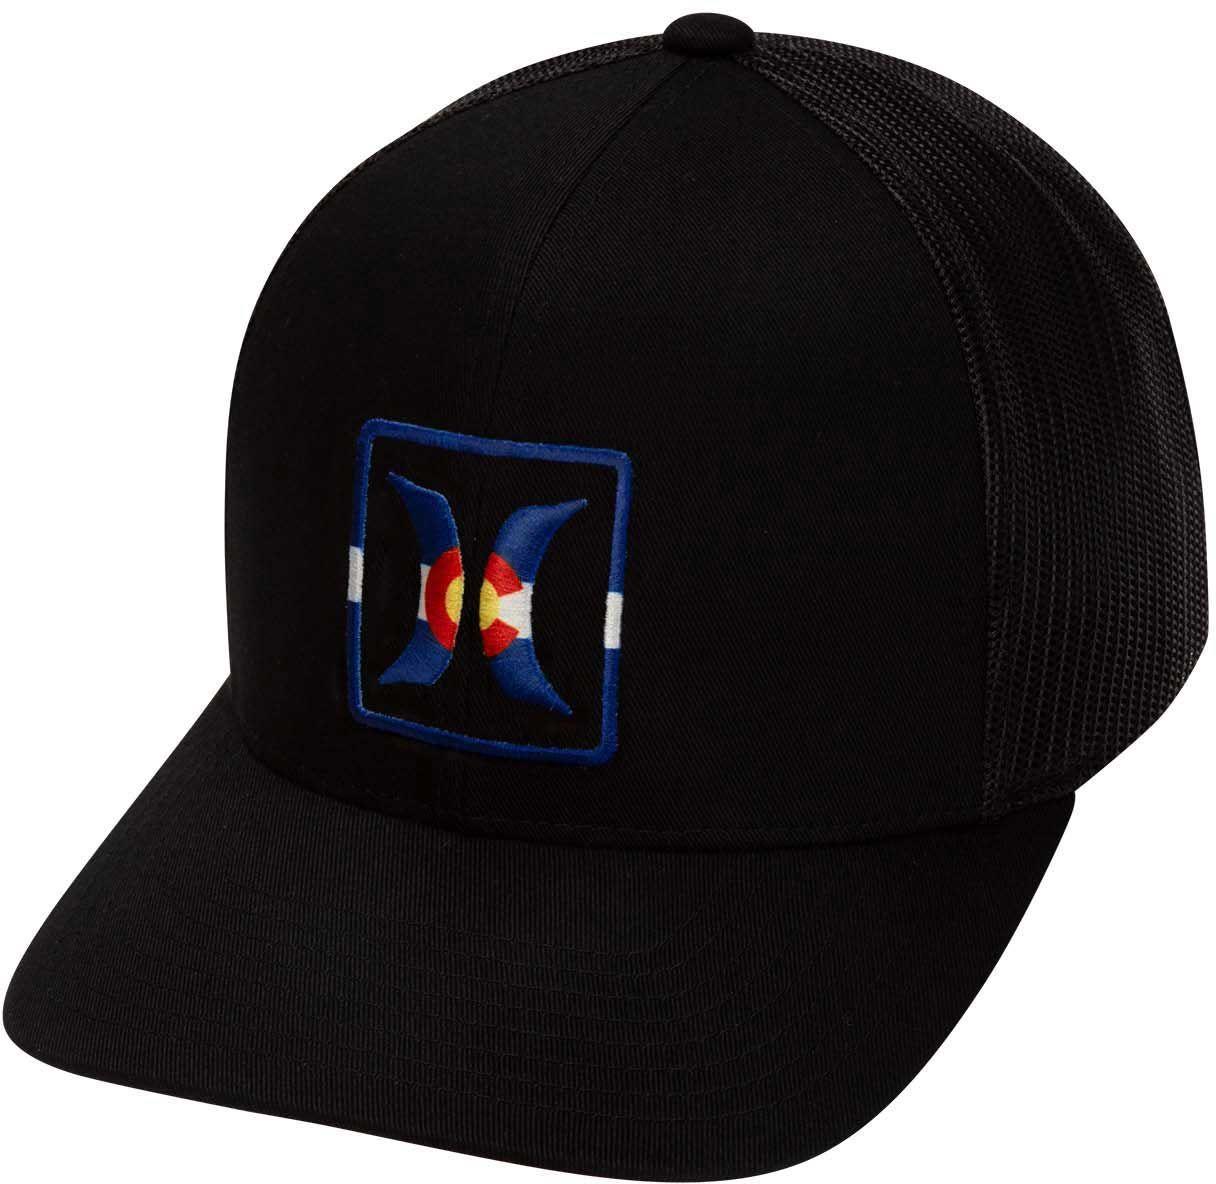 6babefbc Hurley Men's Colorado Trucker Hat | Products | Hats, Hurley ...